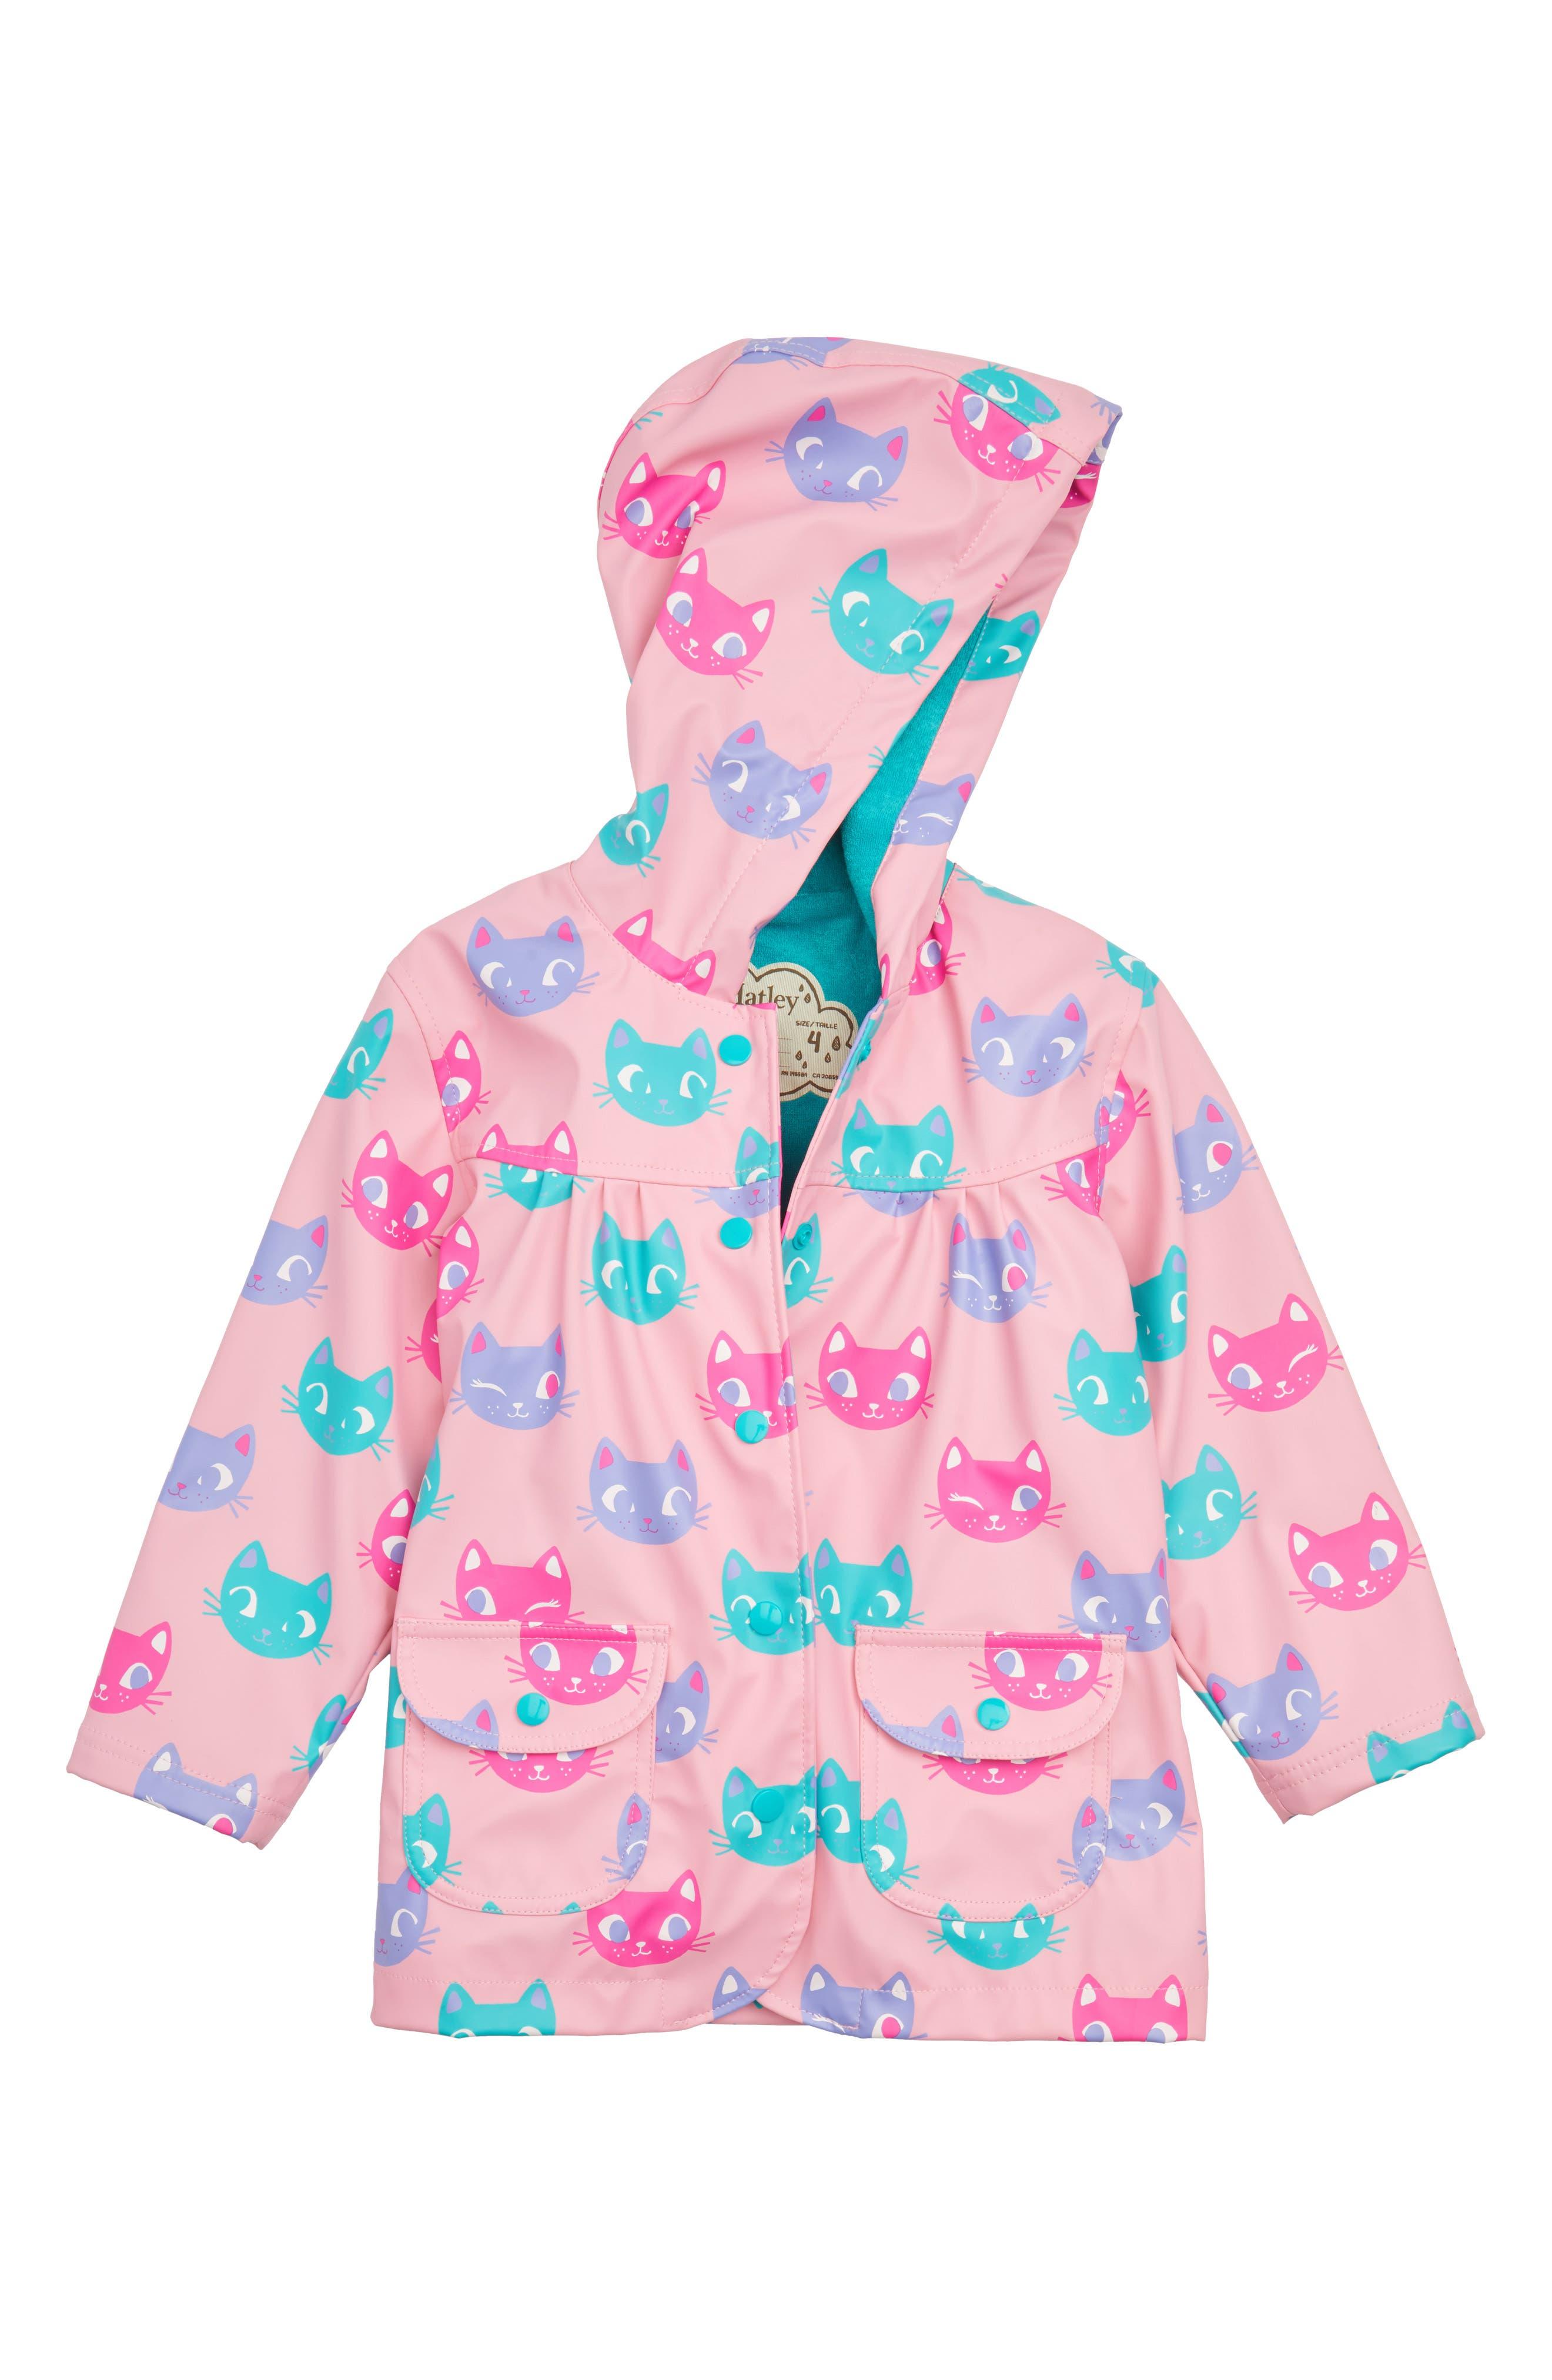 Silly Kitties Print Raincoat,                         Main,                         color, Silly Kitties